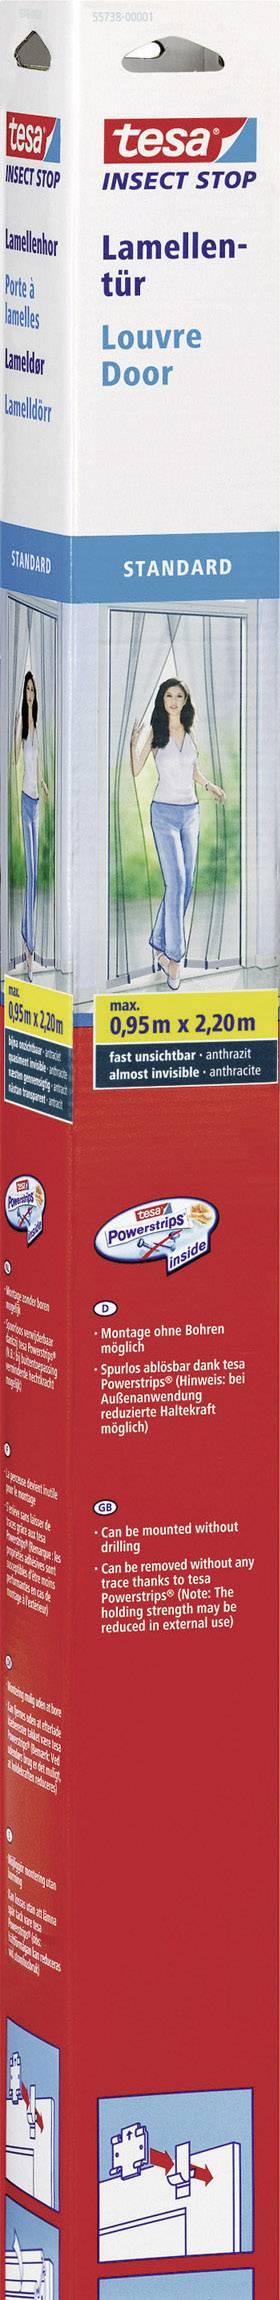 Záves proti hmyzu do dverí Tesa Standard, 55198-1-0, 0.95 x 2.2 m, antracit